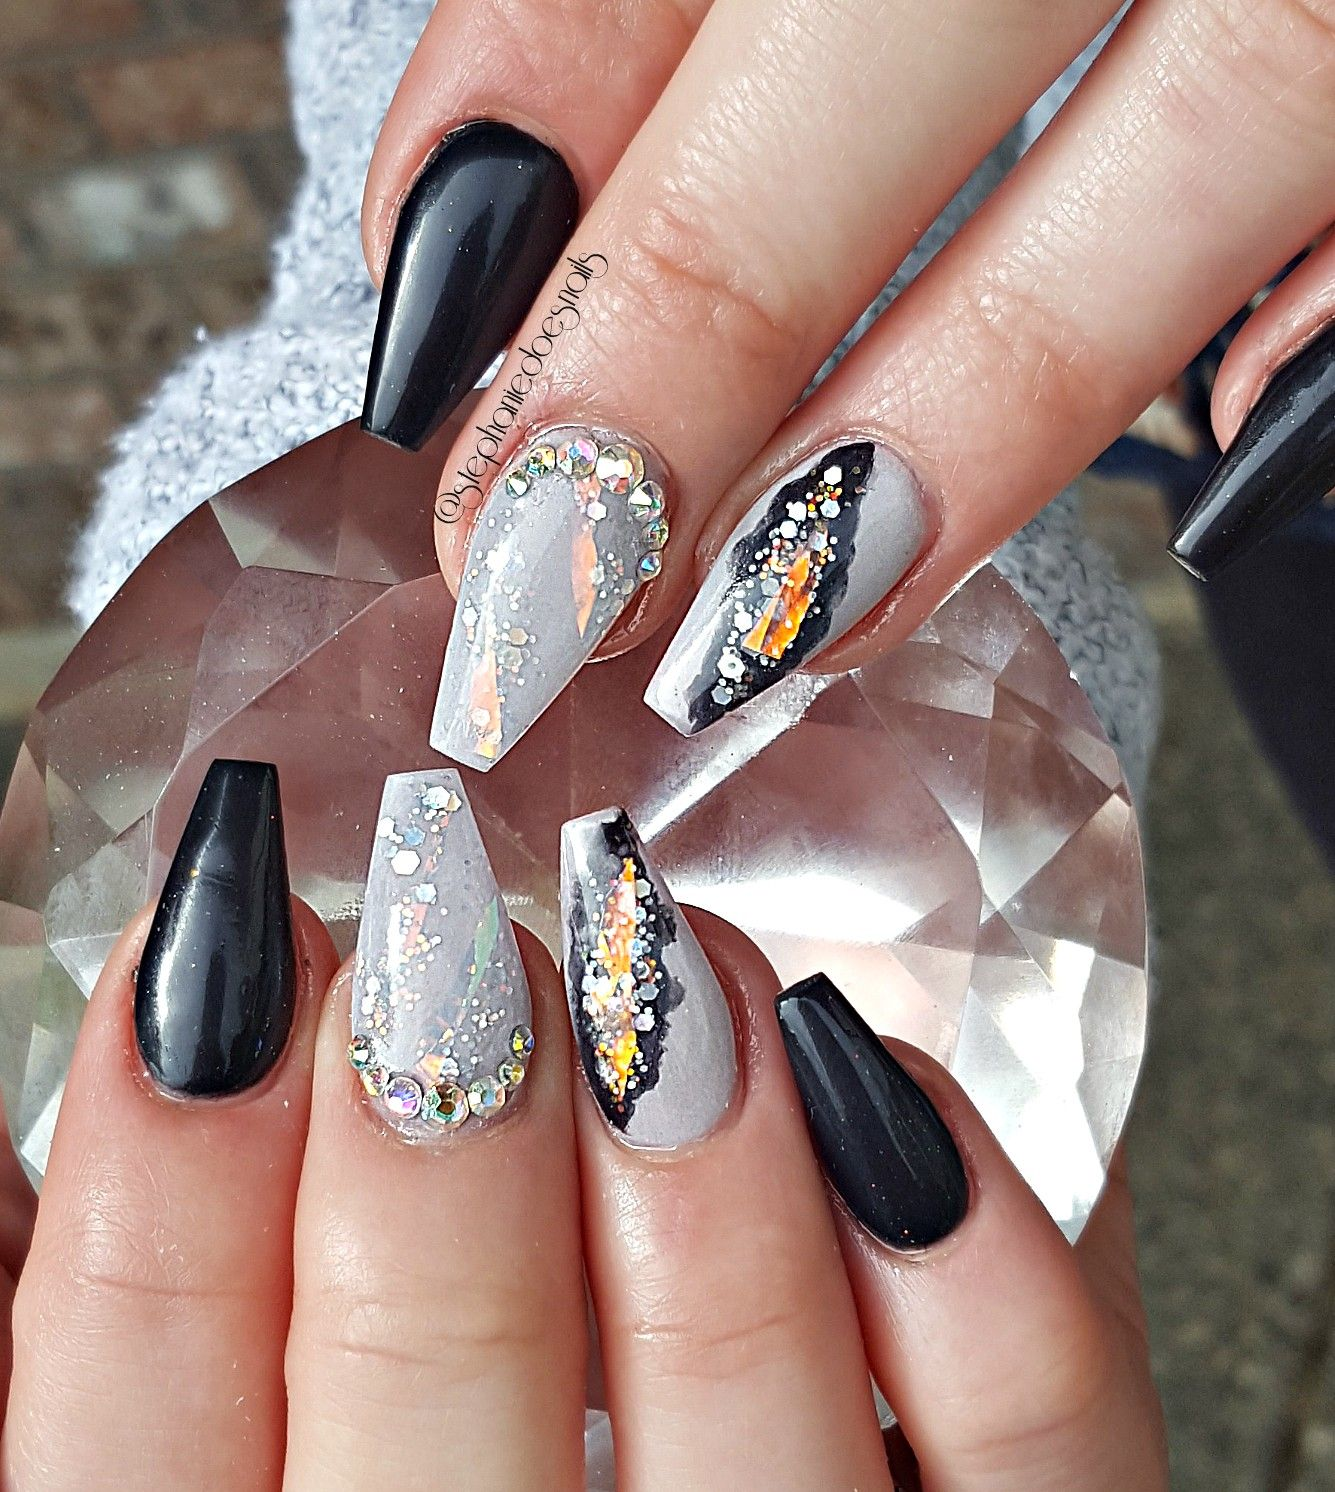 Geode nails | Almond acrylic nails, Halloween acrylic ...